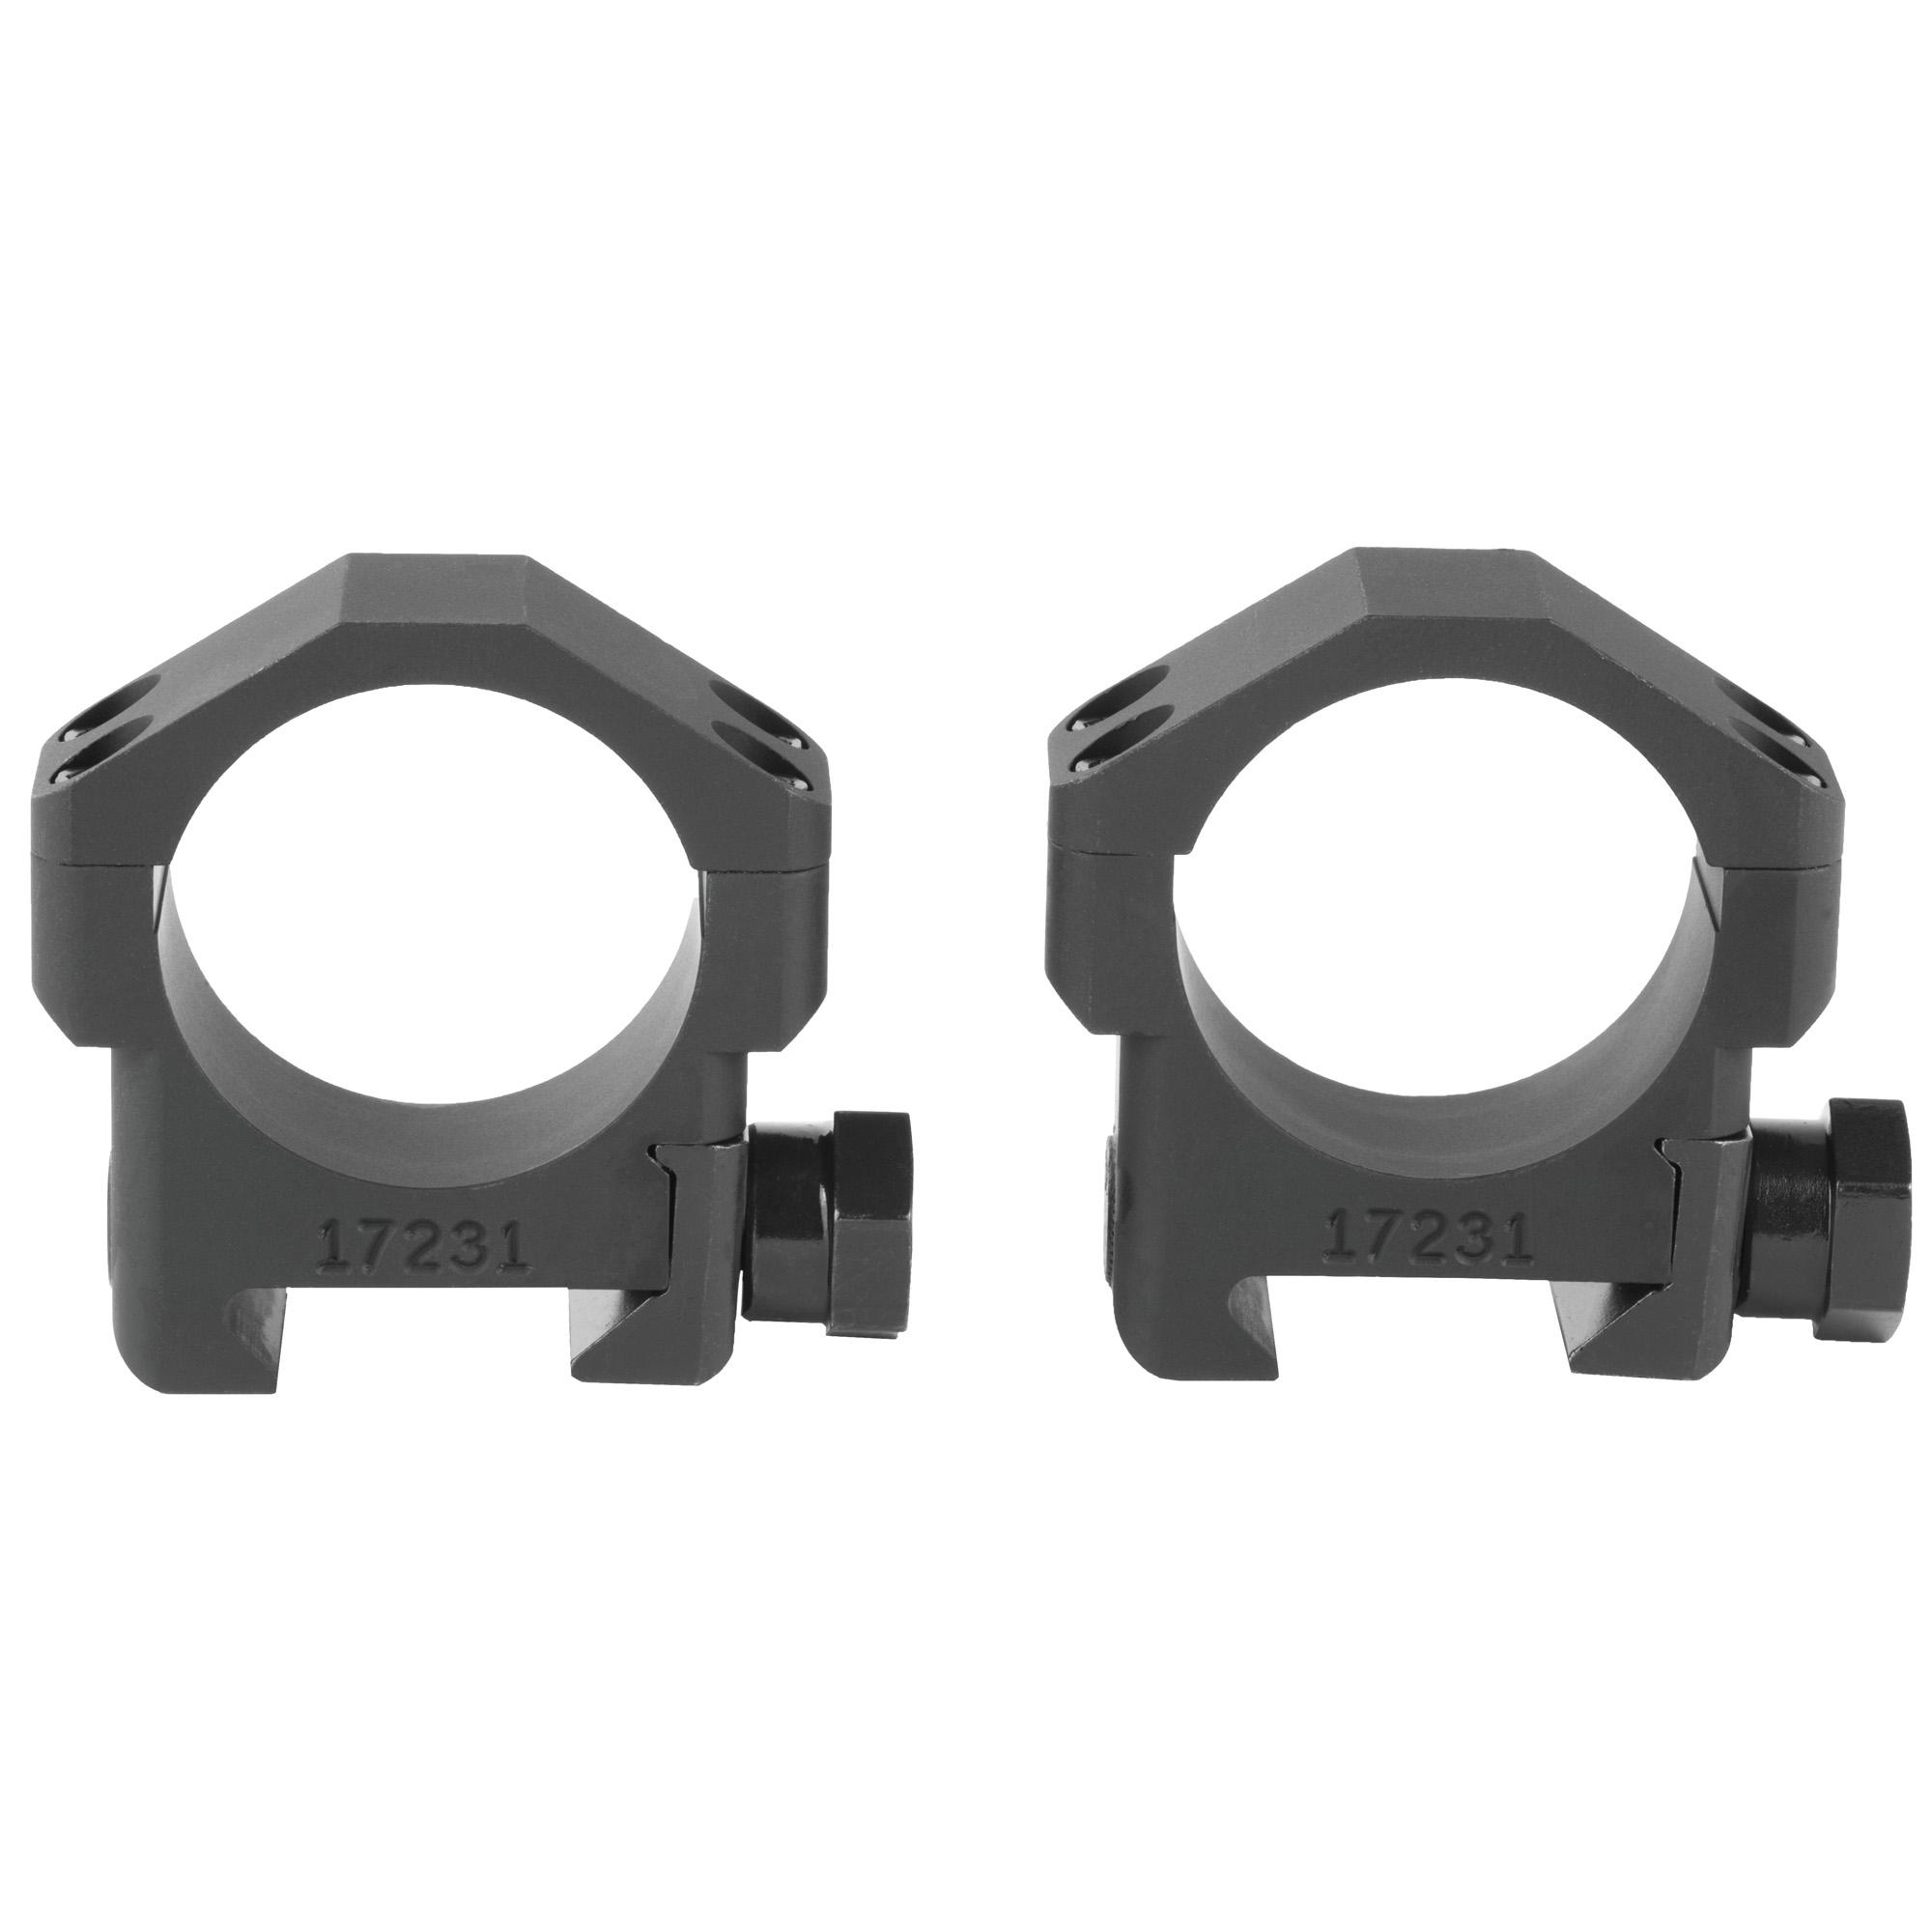 Badger 30mm Scope Ring Std Alloy